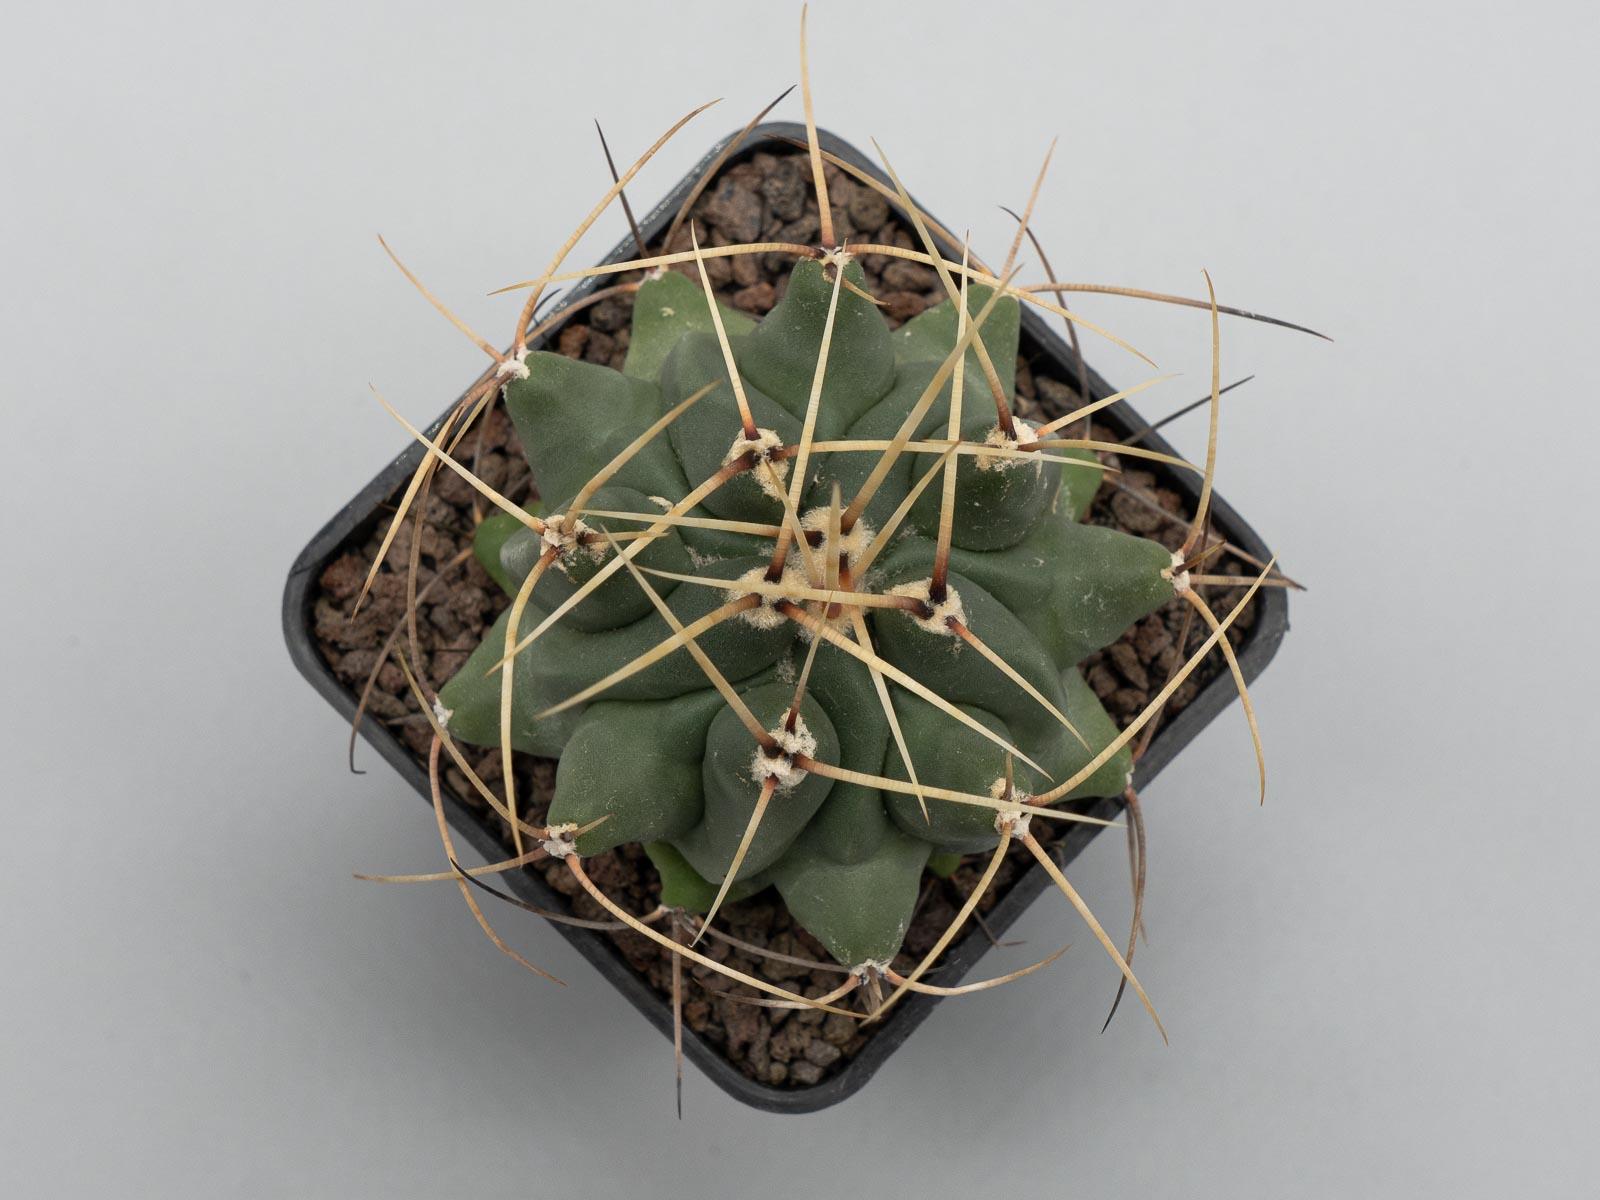 Thelocactus rinconensis v. nidulans